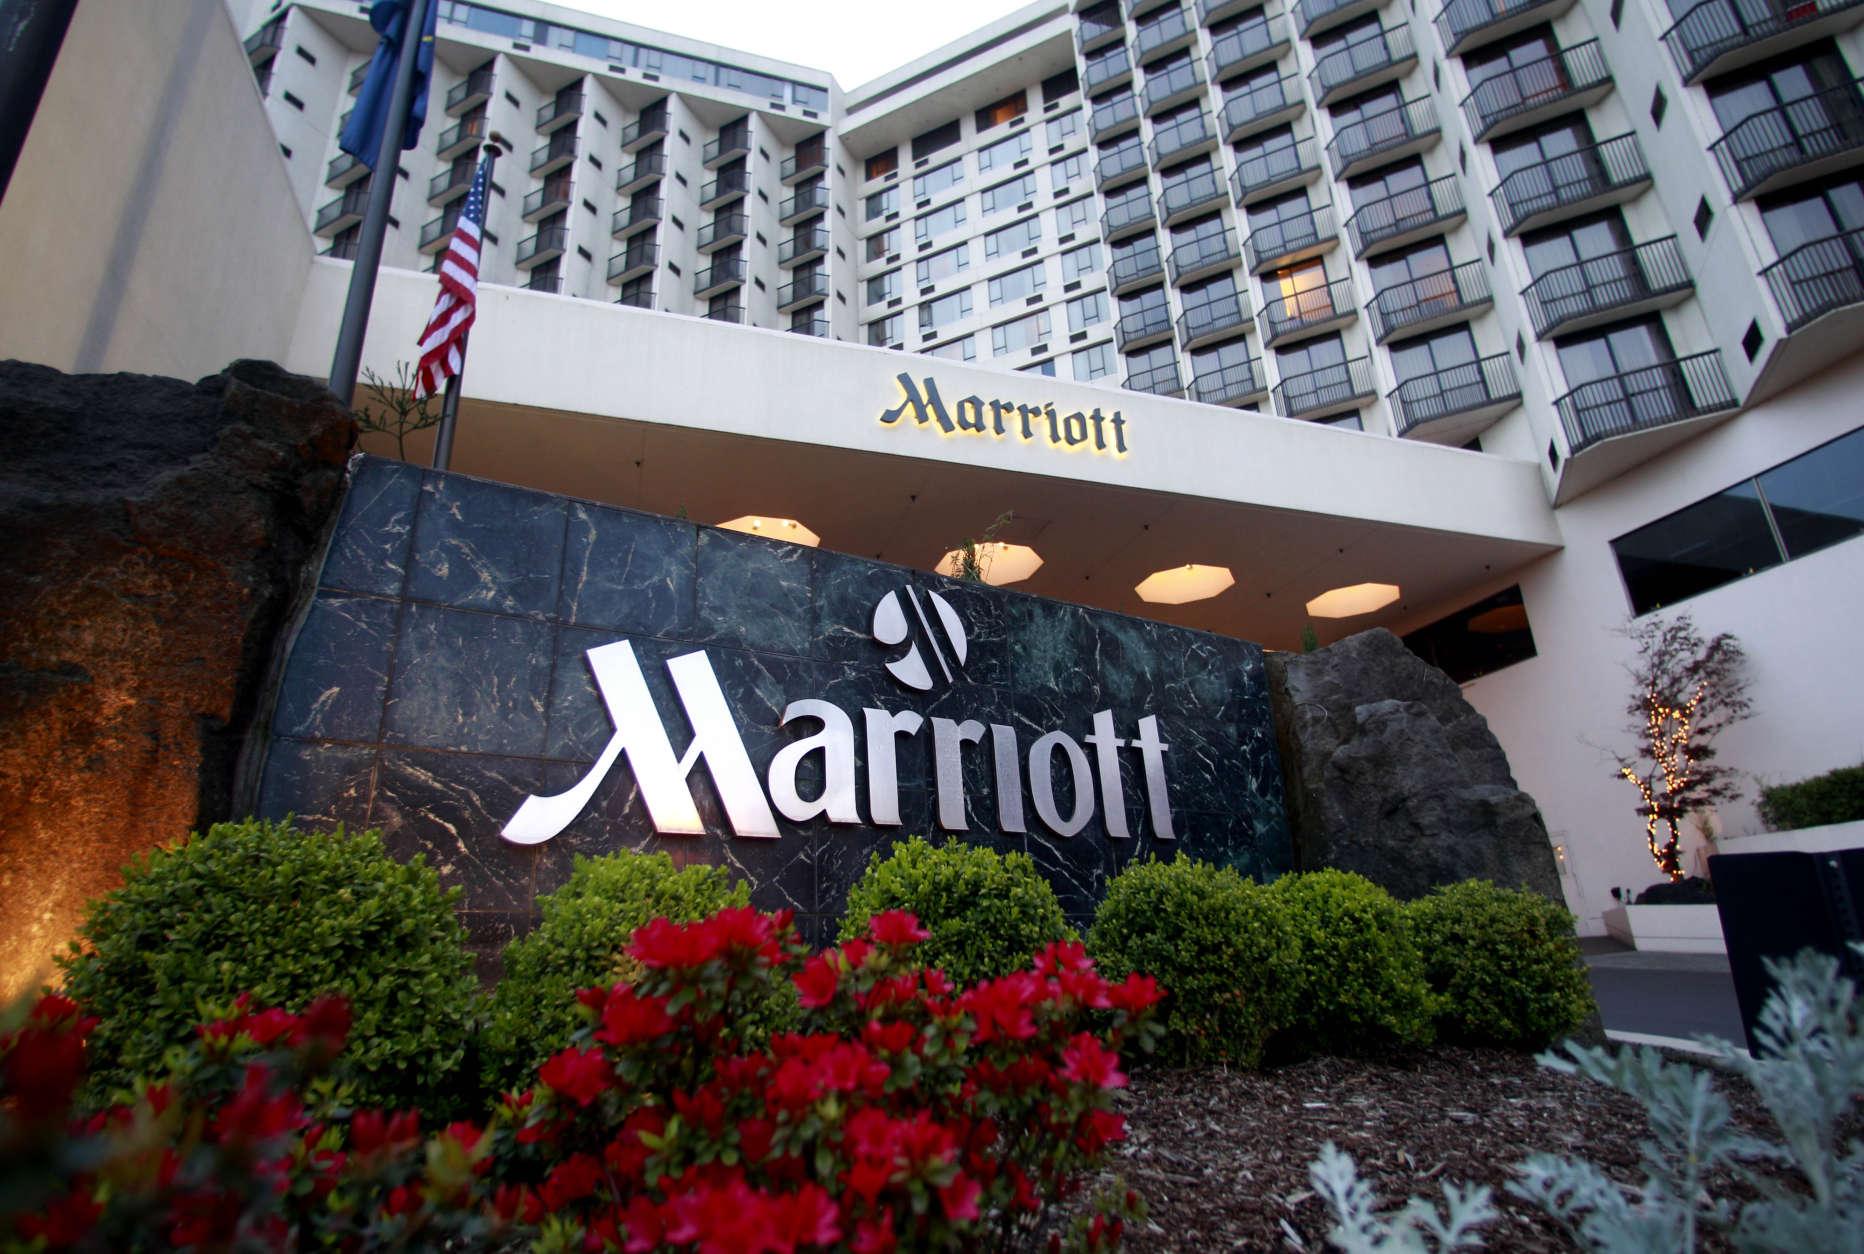 Marriott International Inc., headquartered in Bethesda, came in 33. (AP/Rick Bowmer)